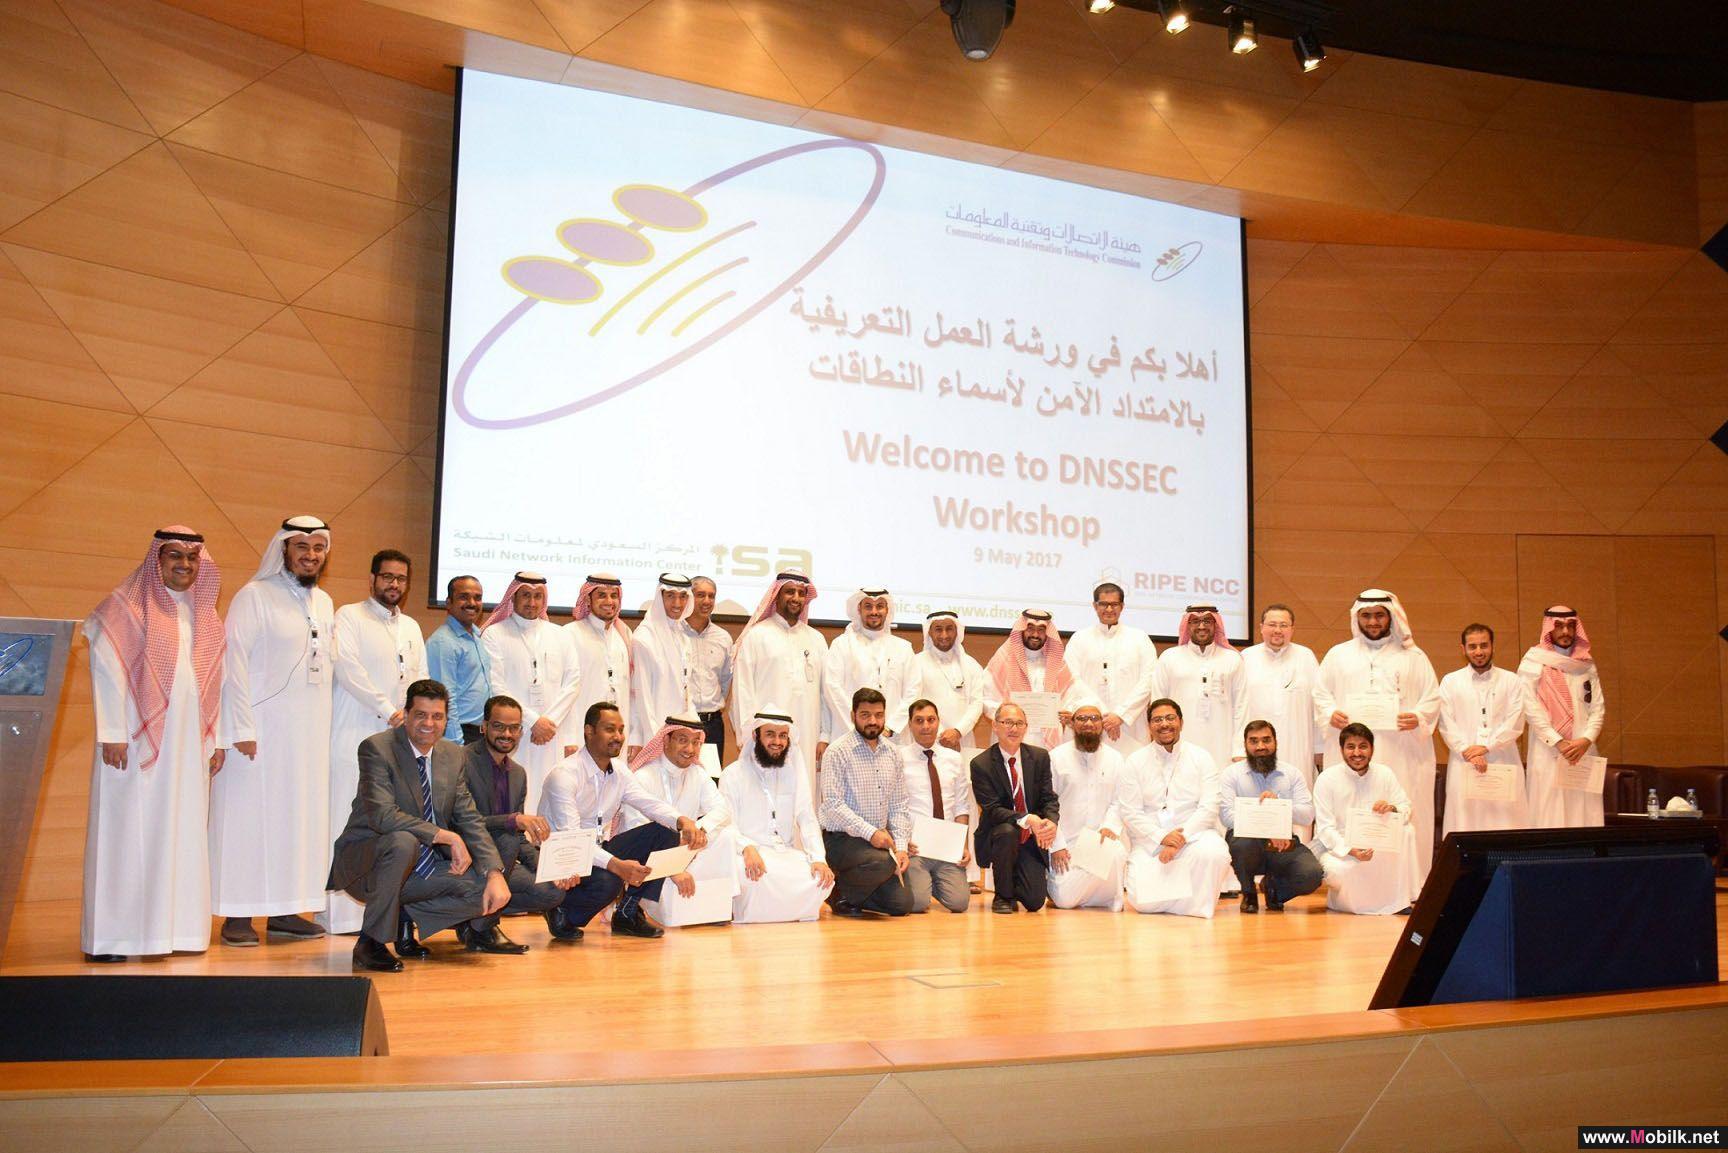 Saudi Arabia's CITC Successfully Concludes Workshop on DNSSEC